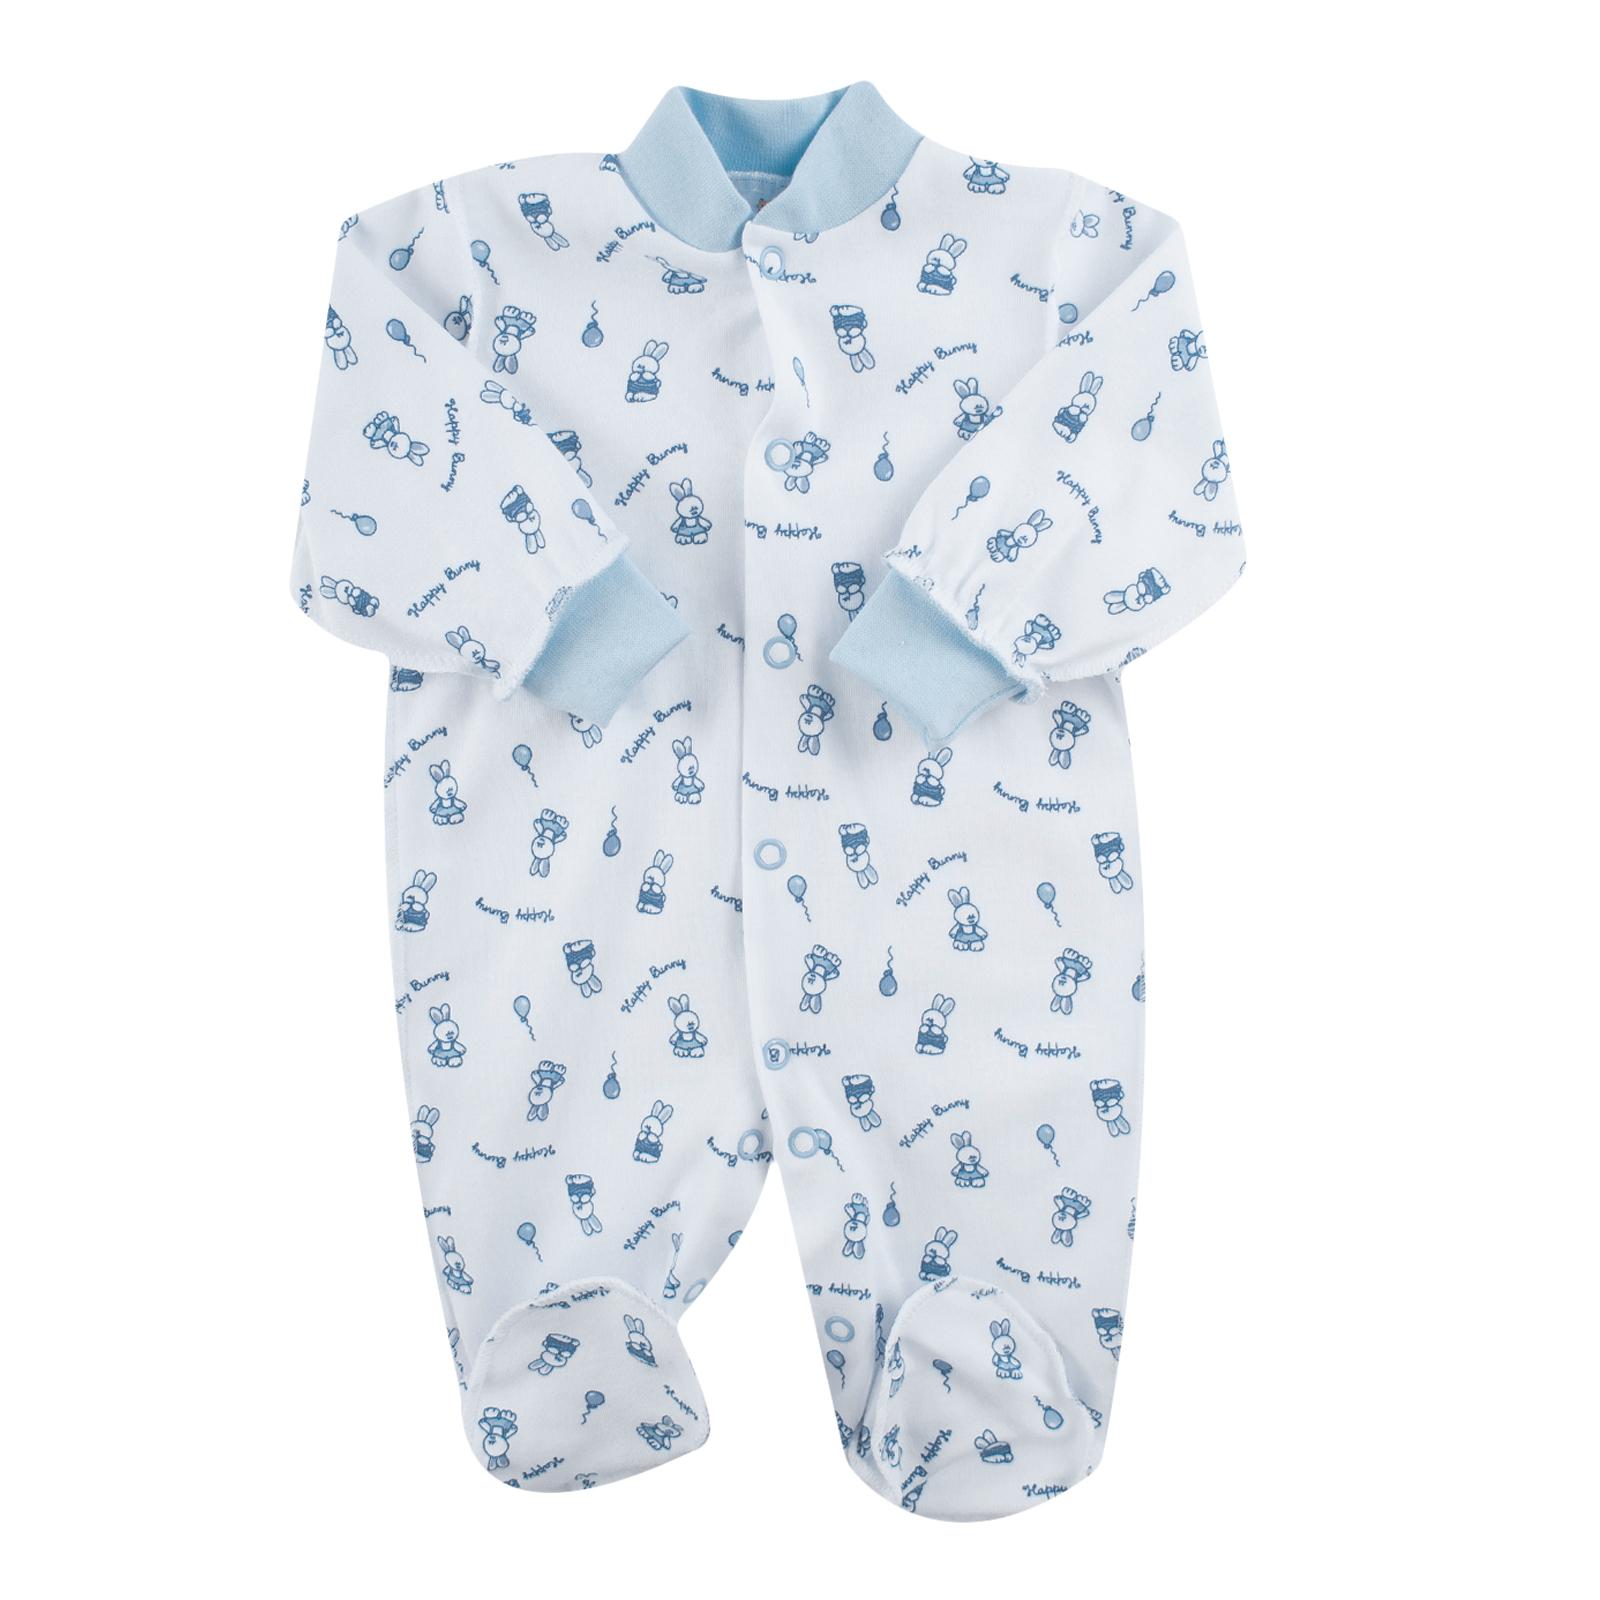 Комбинезон КОТМАРКОТ для мальчика, цвет набивка голубой тон 9-12 мес (размер 80)